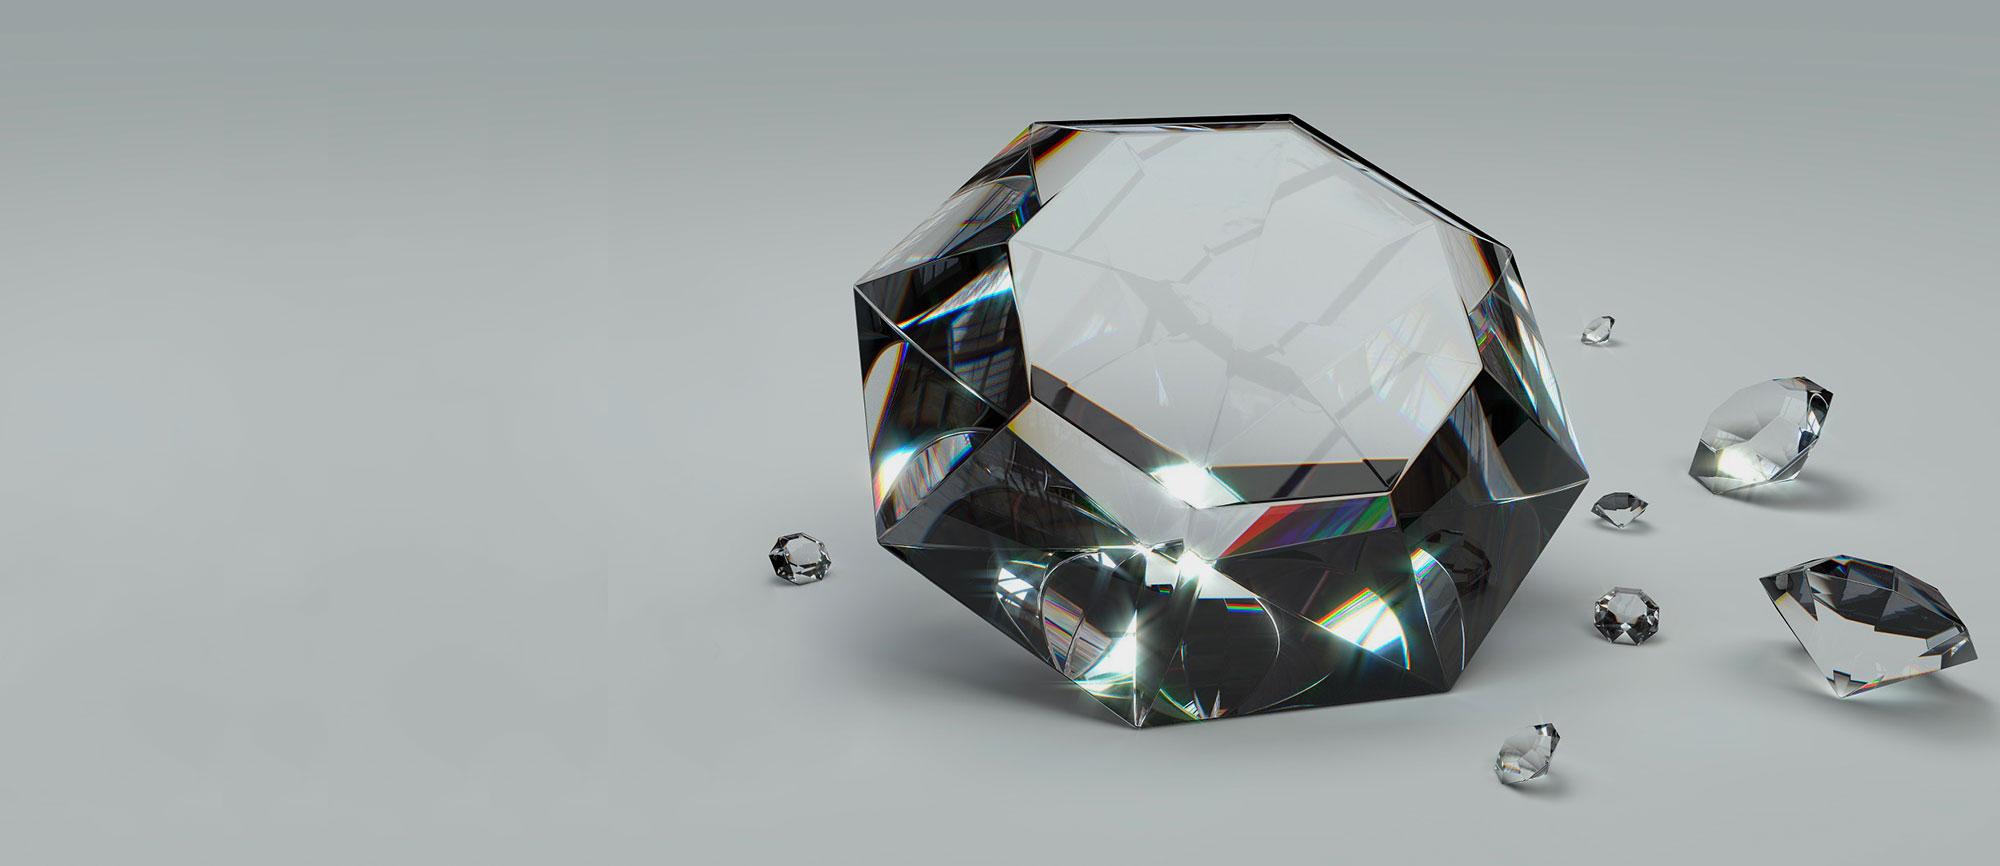 Lame a nastro diamantate